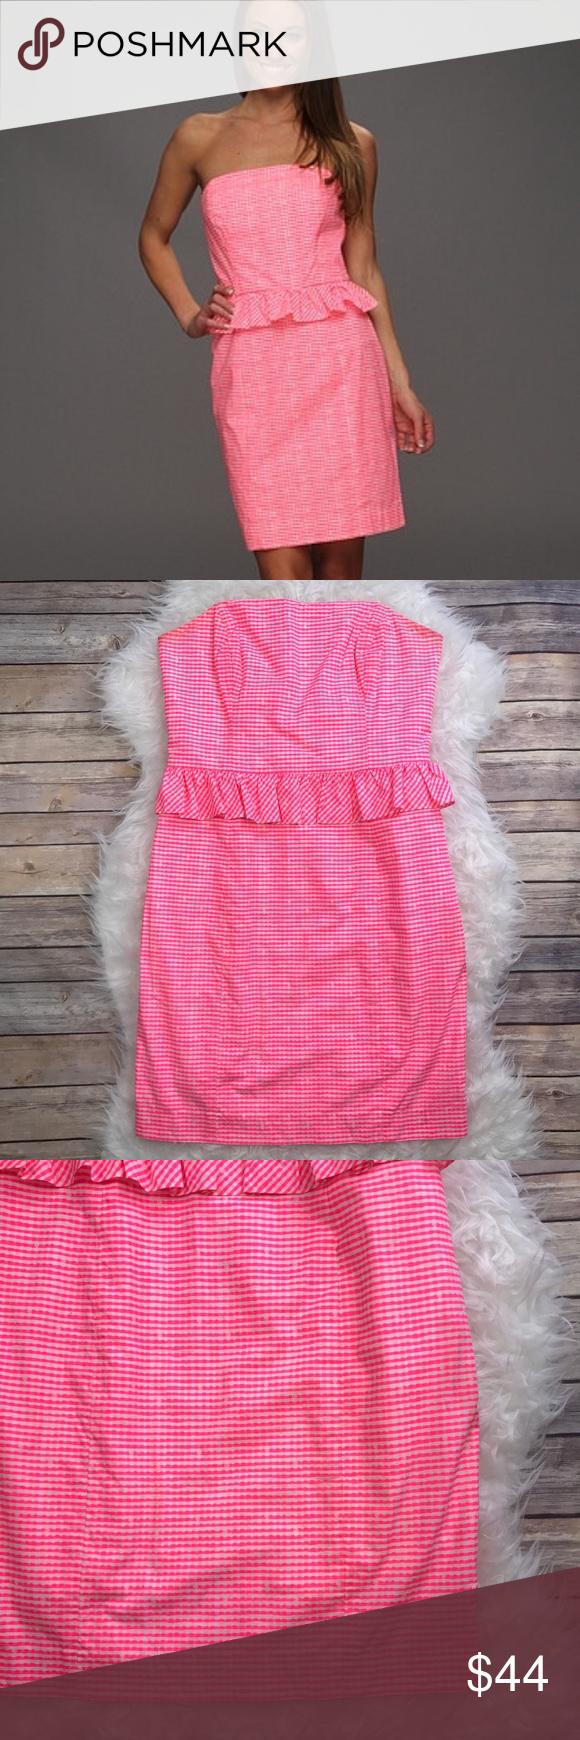 Lilly Pulitzer Fiesta Pink Lowe Peplum Dress